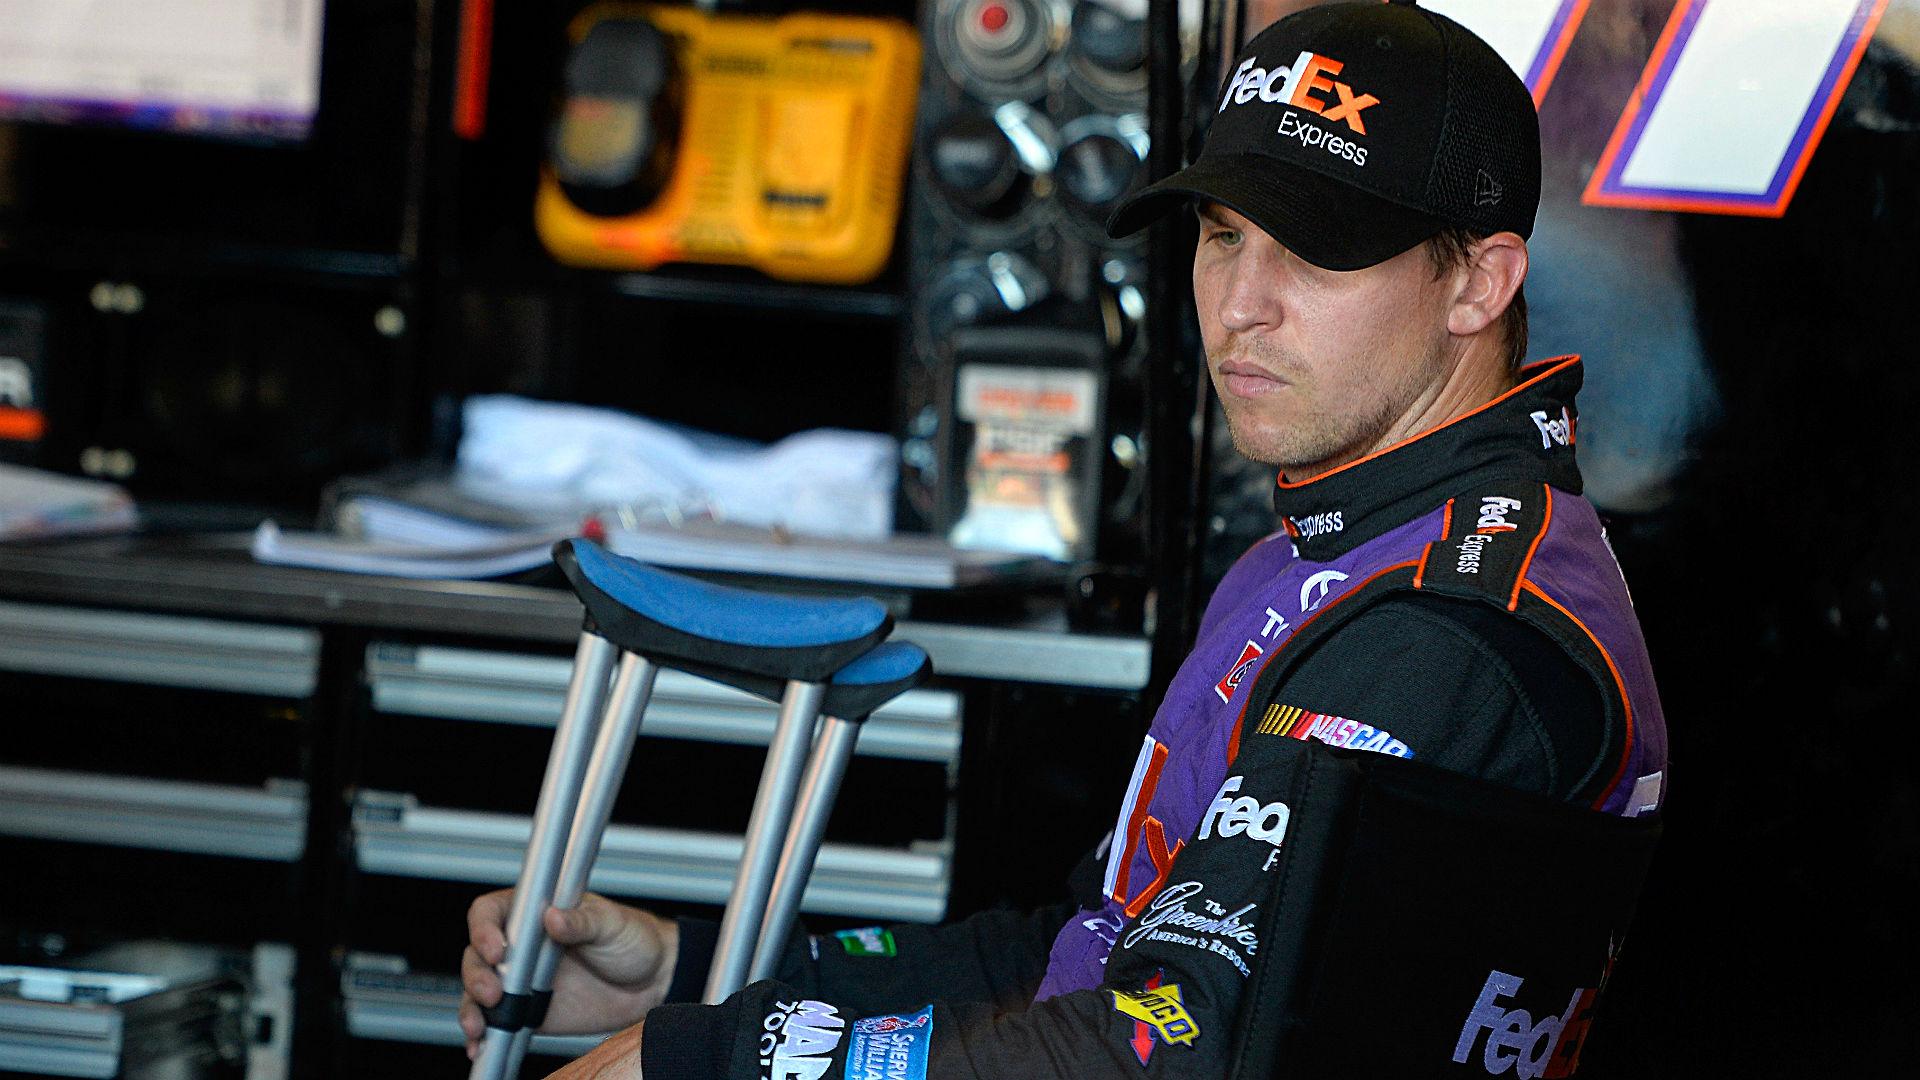 NASCAR starting lineup at Charlotte: Denny Hamlin on pole, JGR teammate Matt Kenseth on front row